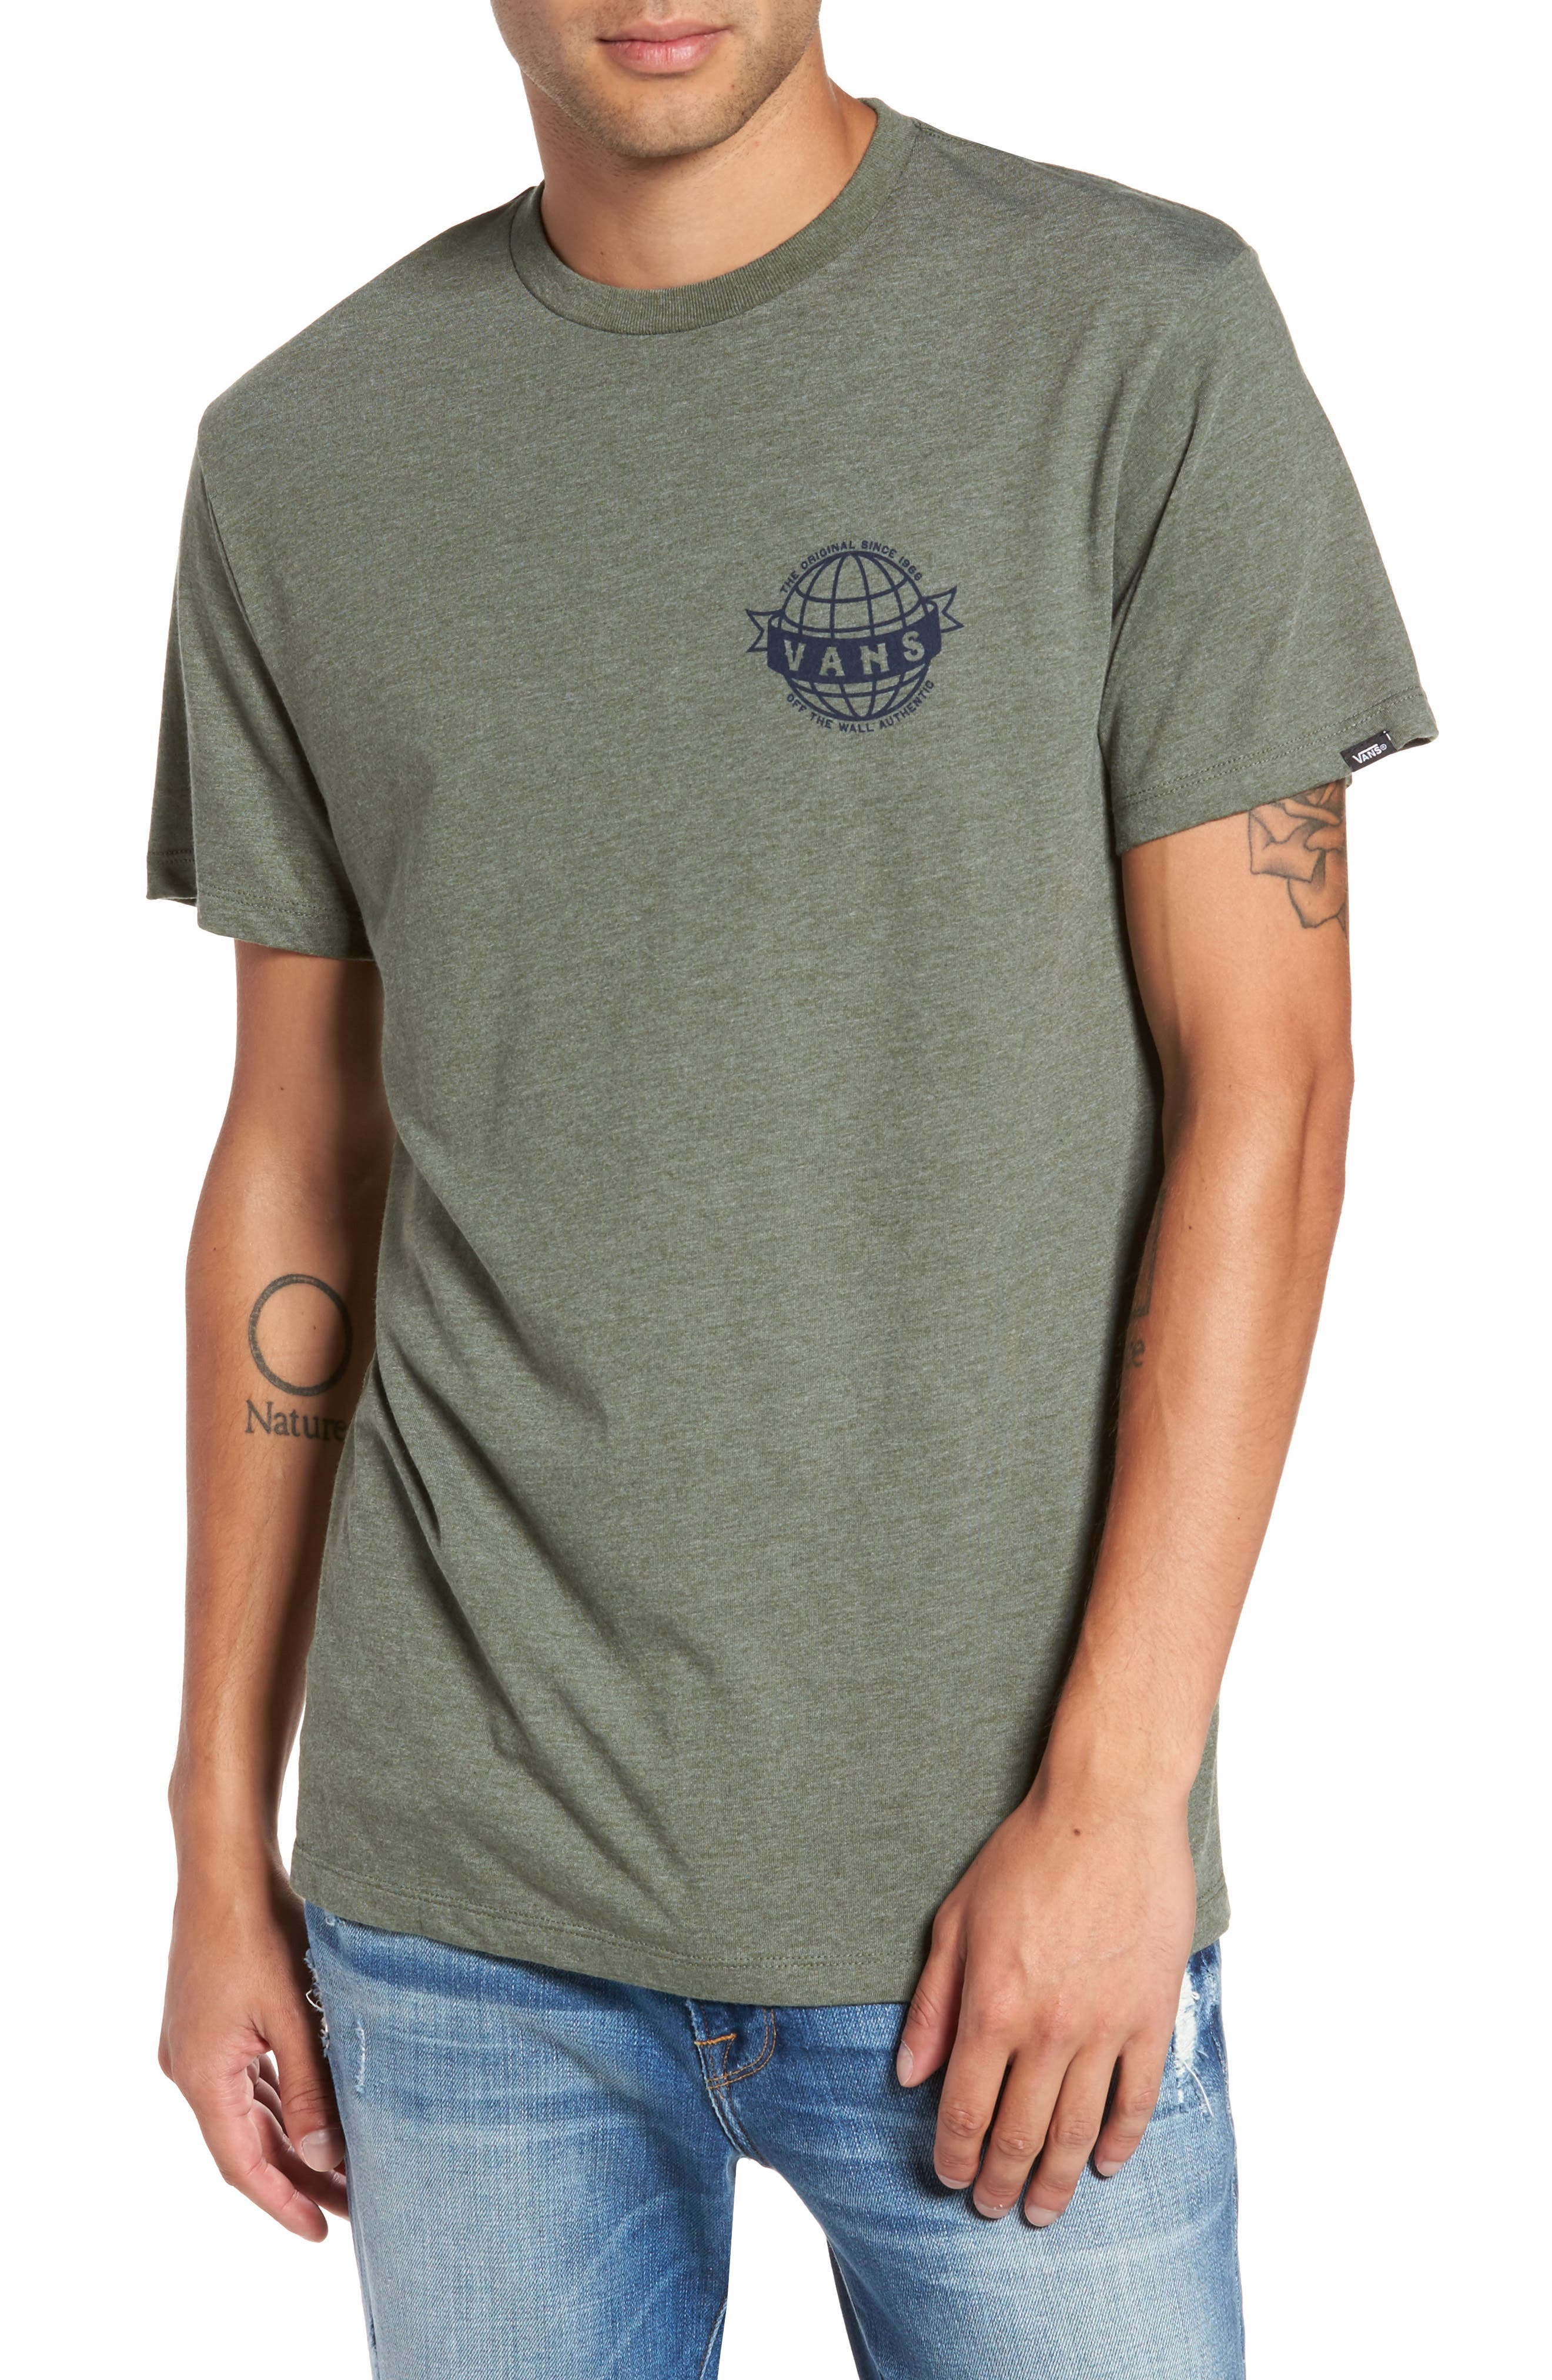 Global Landing Logo Graphic T-Shirt,                         Main,                         color, 301